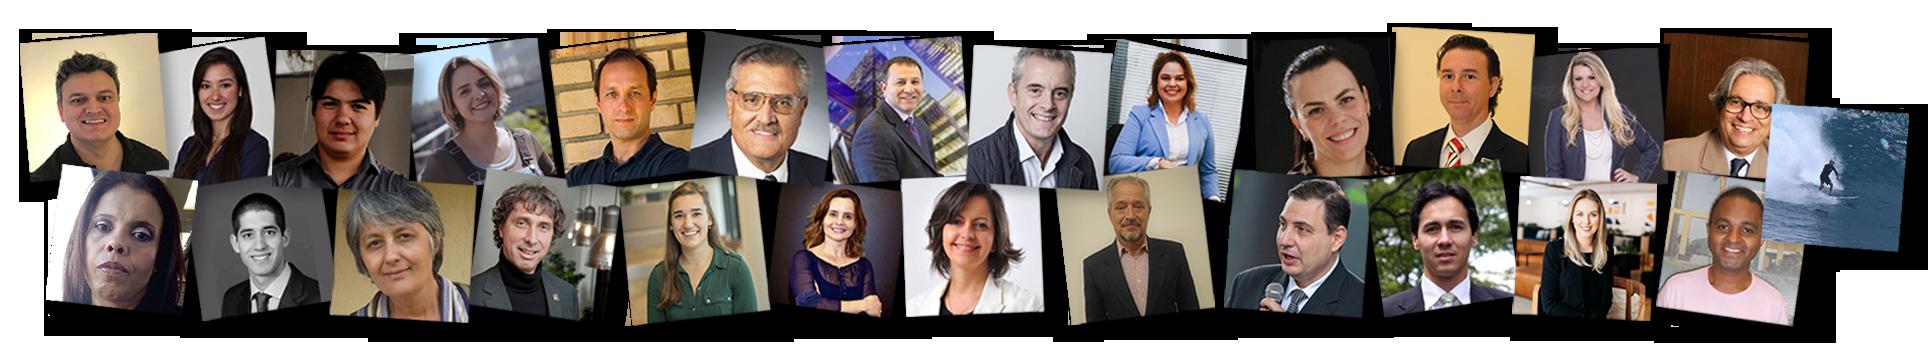 palestrantes-abrafac-congresso-expo-2019